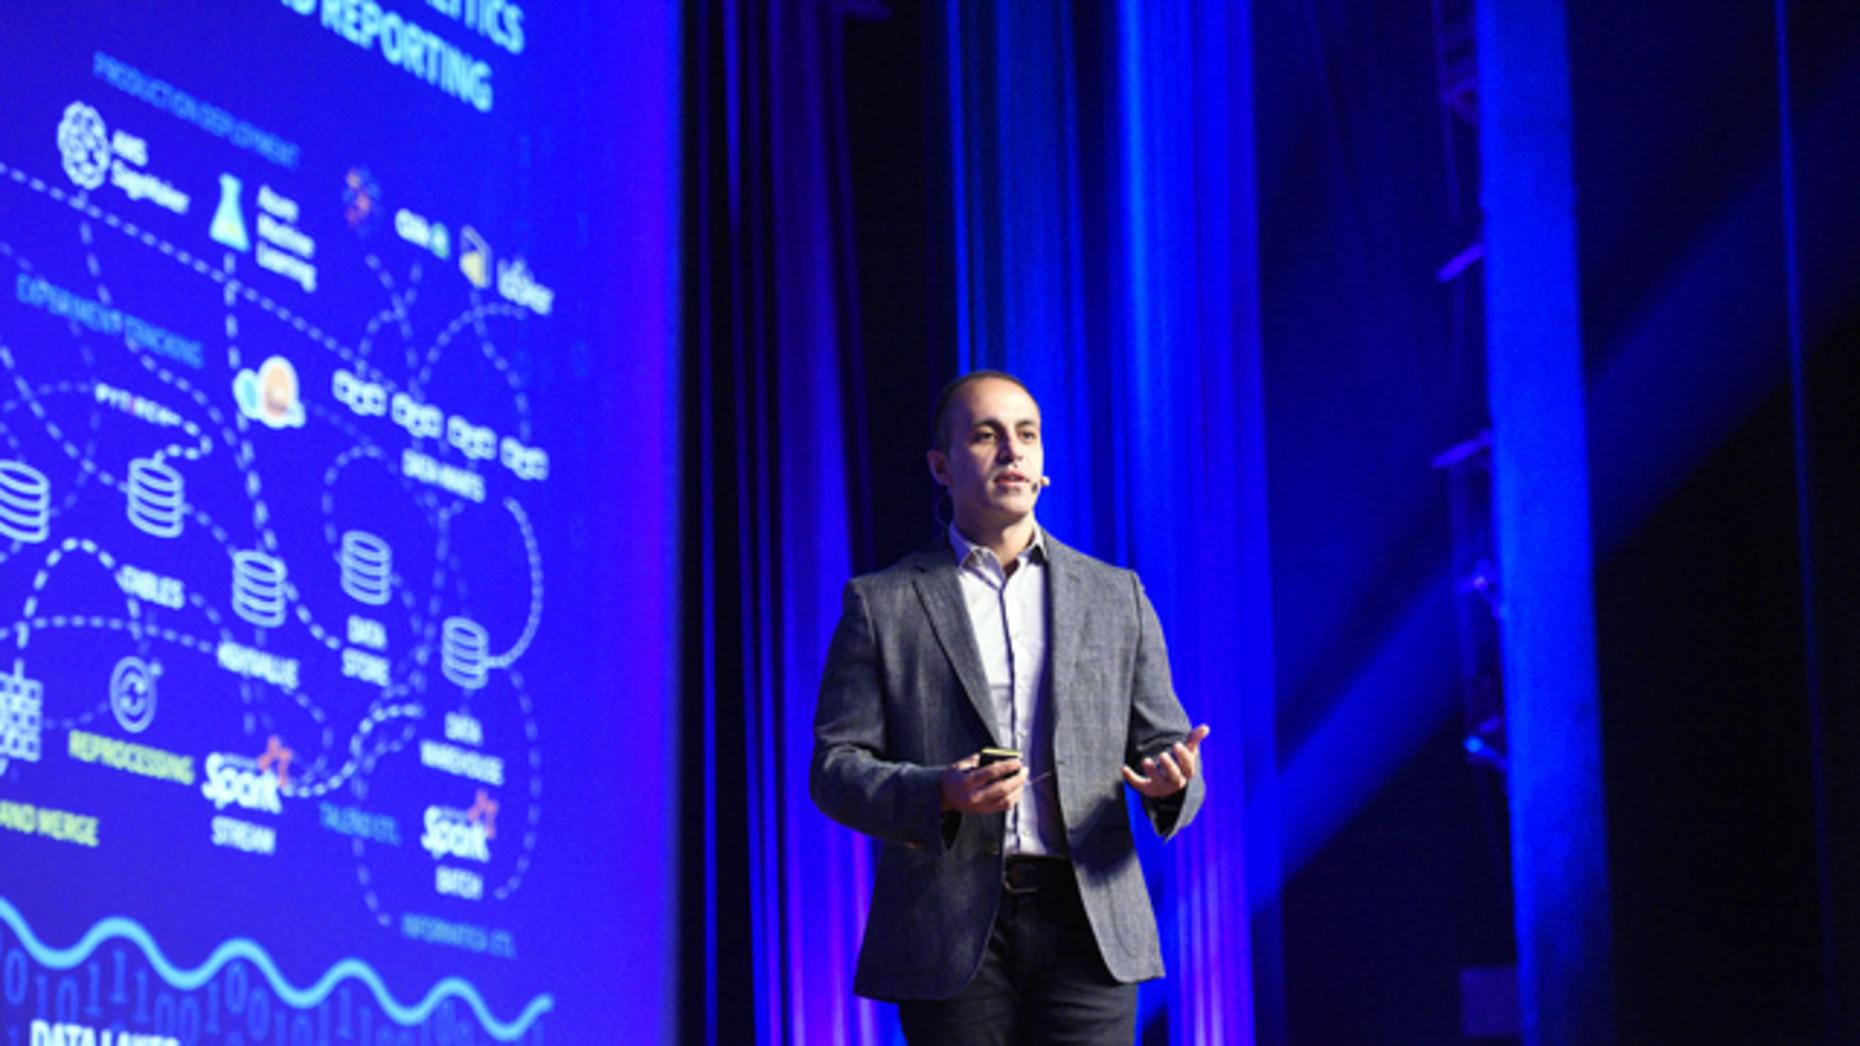 Ali Ghodsi, CEO of Databricks. Image: Databricks